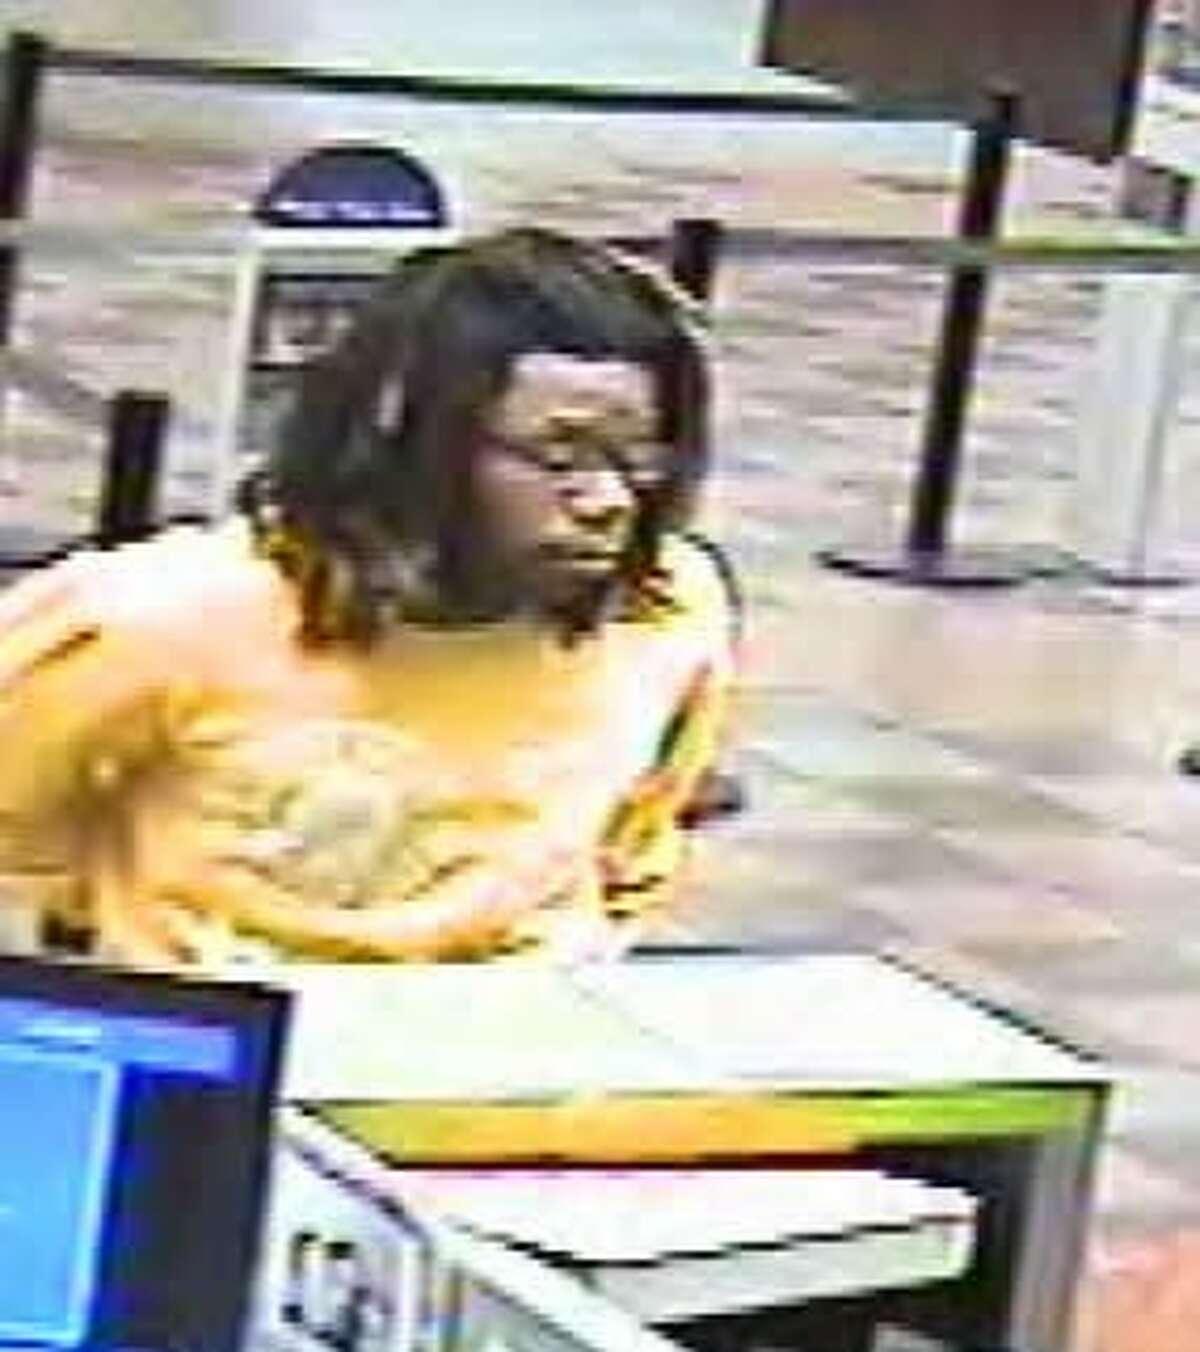 Bank surveillance photo of second suspect.